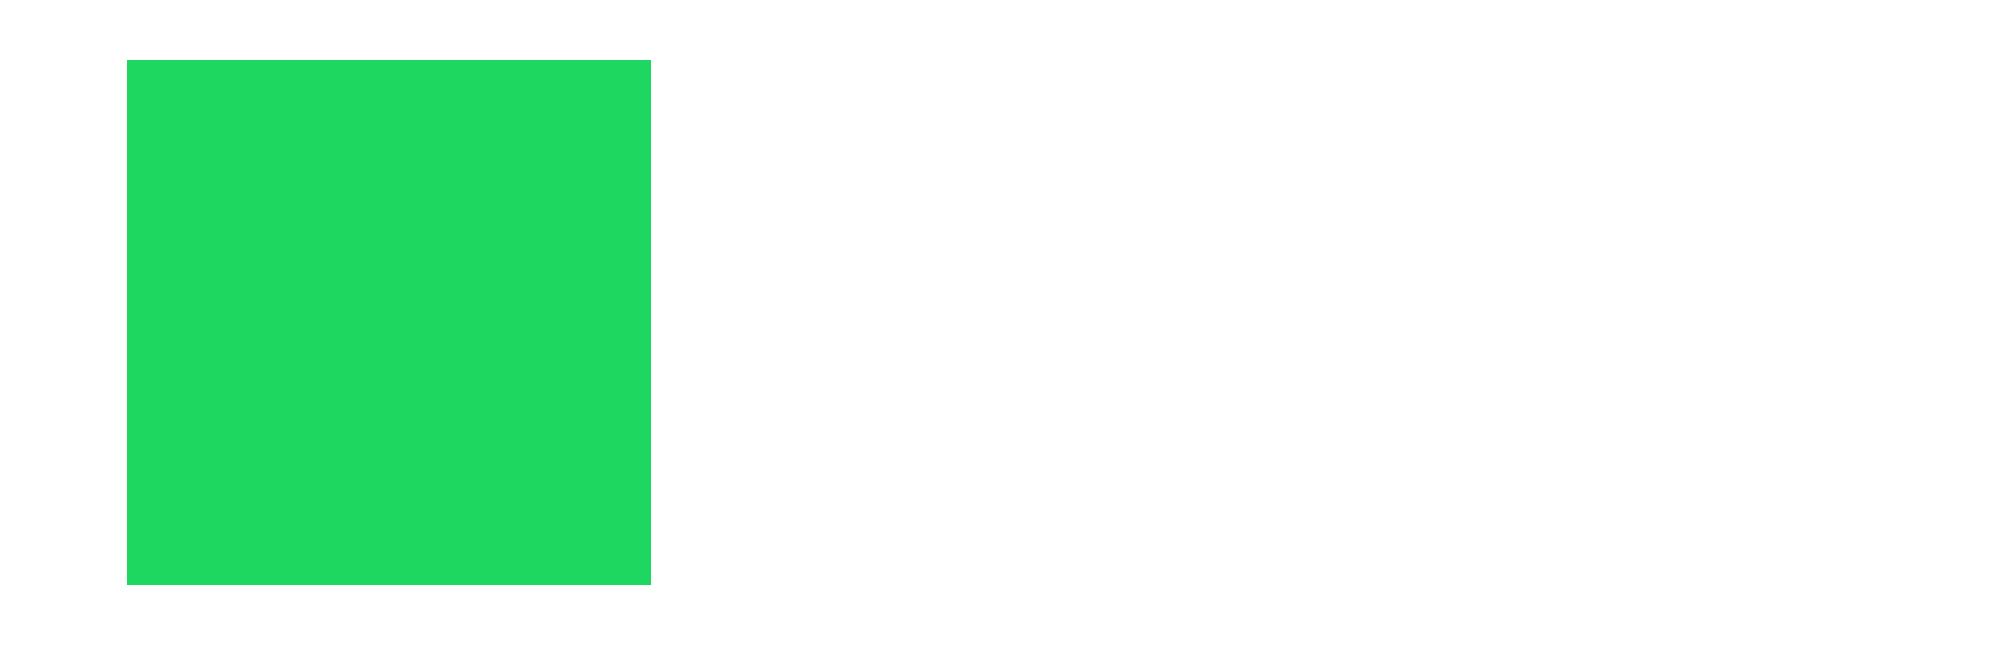 Rosanna Rocci bei Spotify